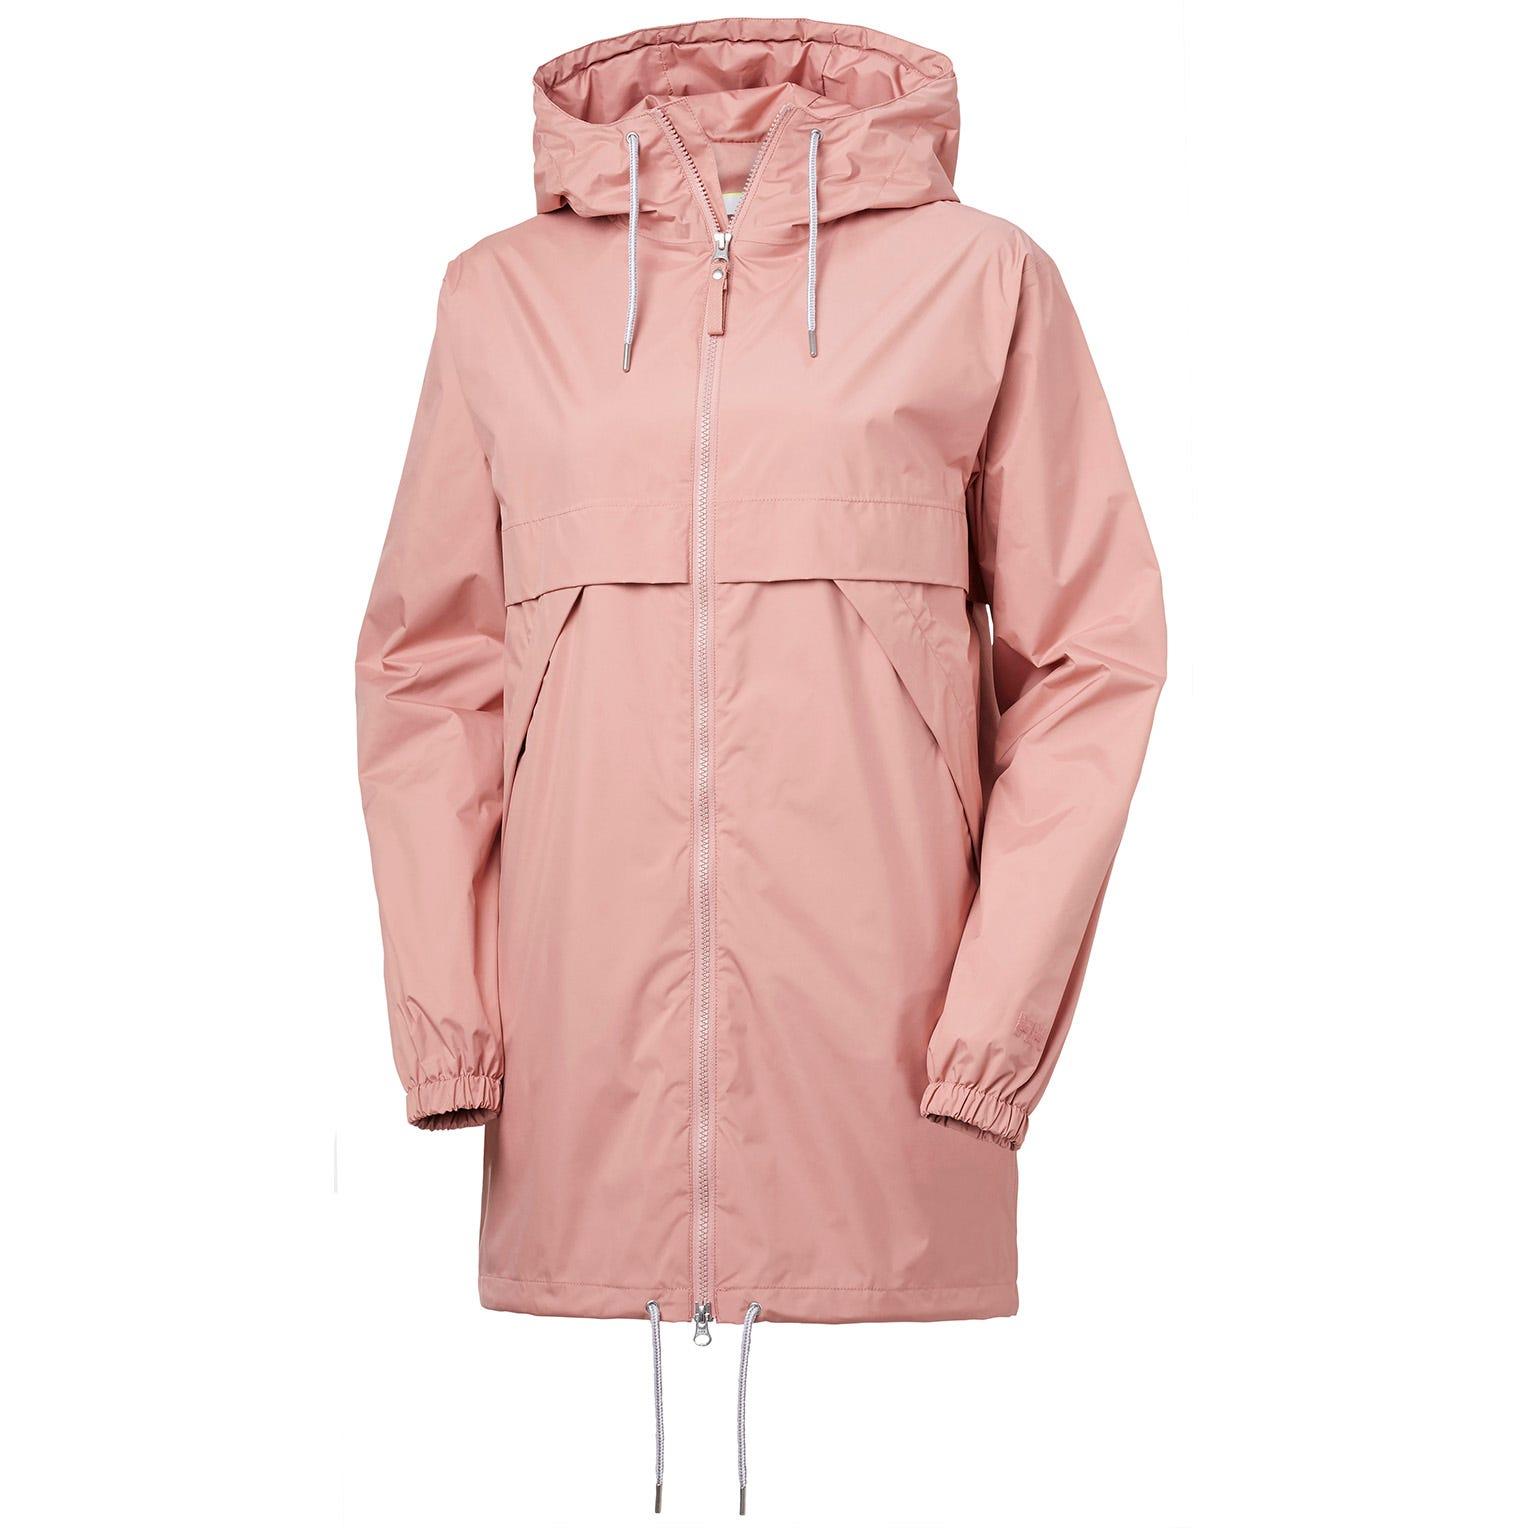 Helly Hansen Womens Jpn Raincoat Pink XL